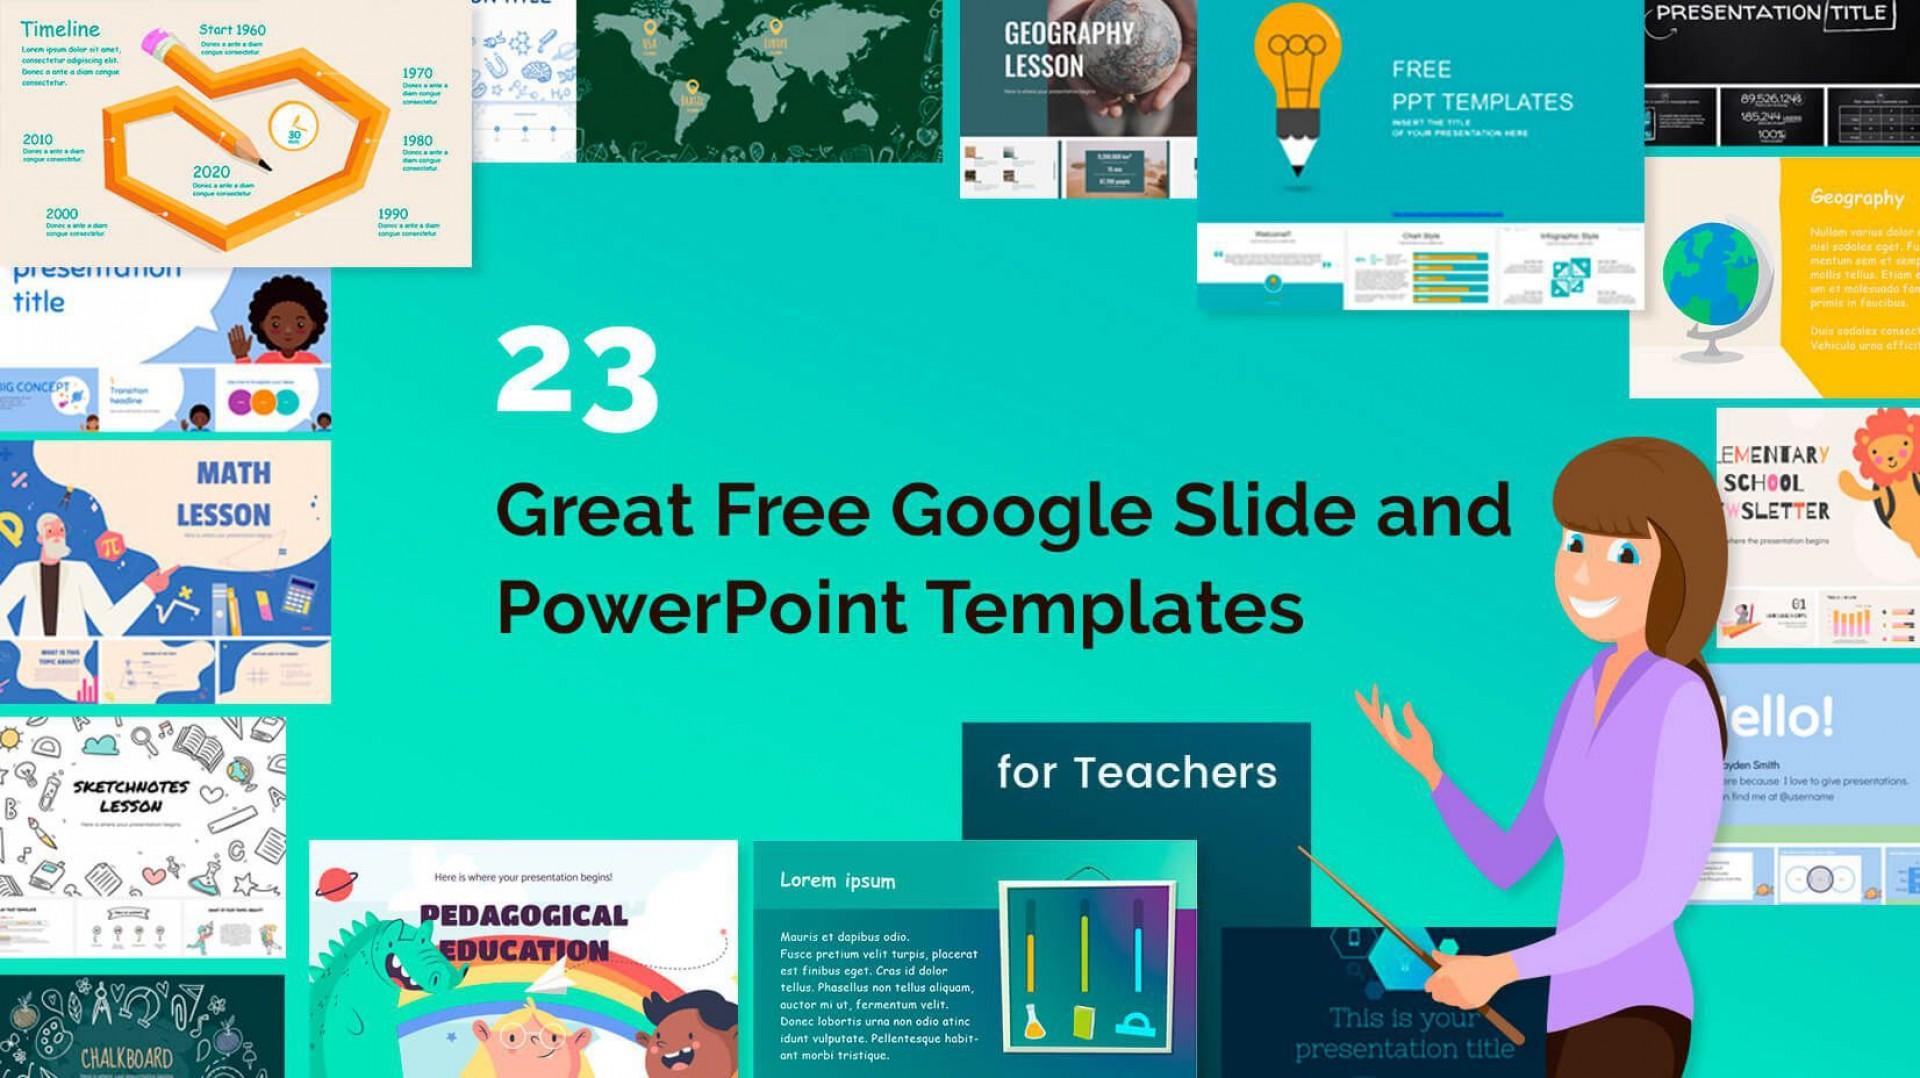 008 Fascinating Google Newsletter Template For Teacher Highest Clarity  Teachers Free1920